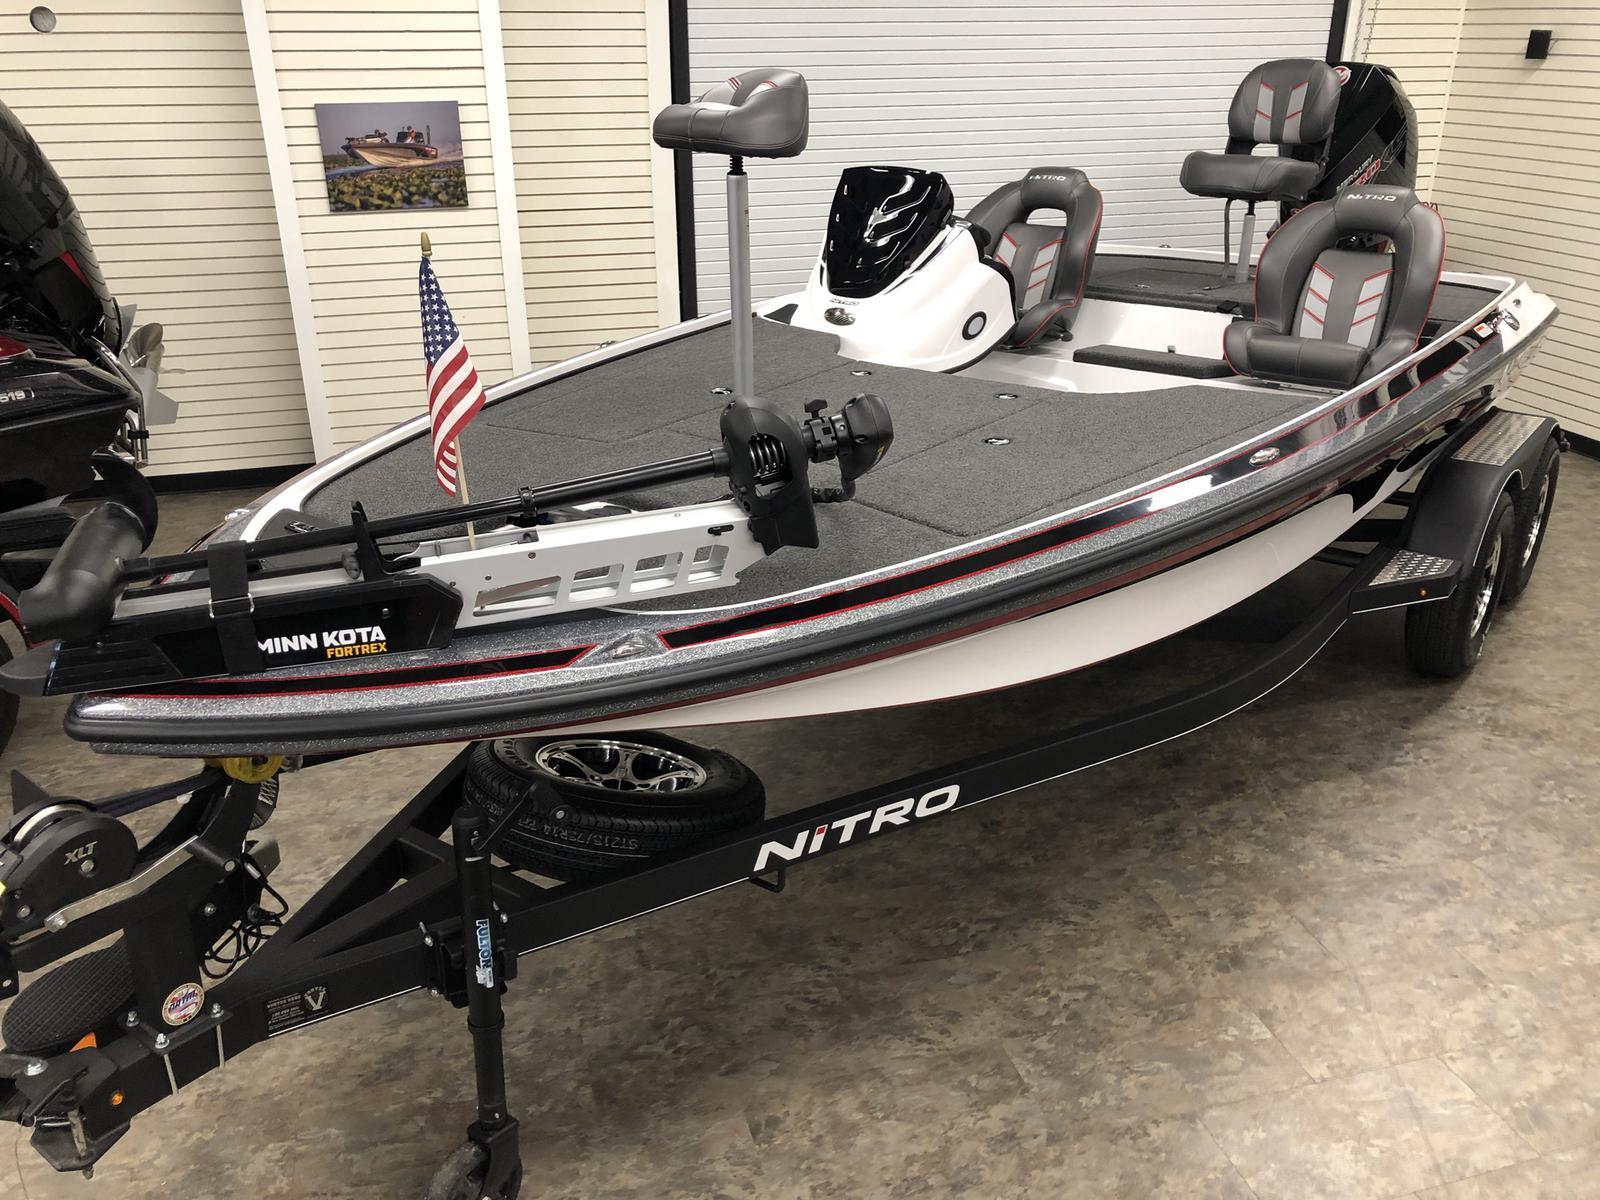 2019 Nitro boat for sale, model of the boat is Z19 & Image # 39 of 39